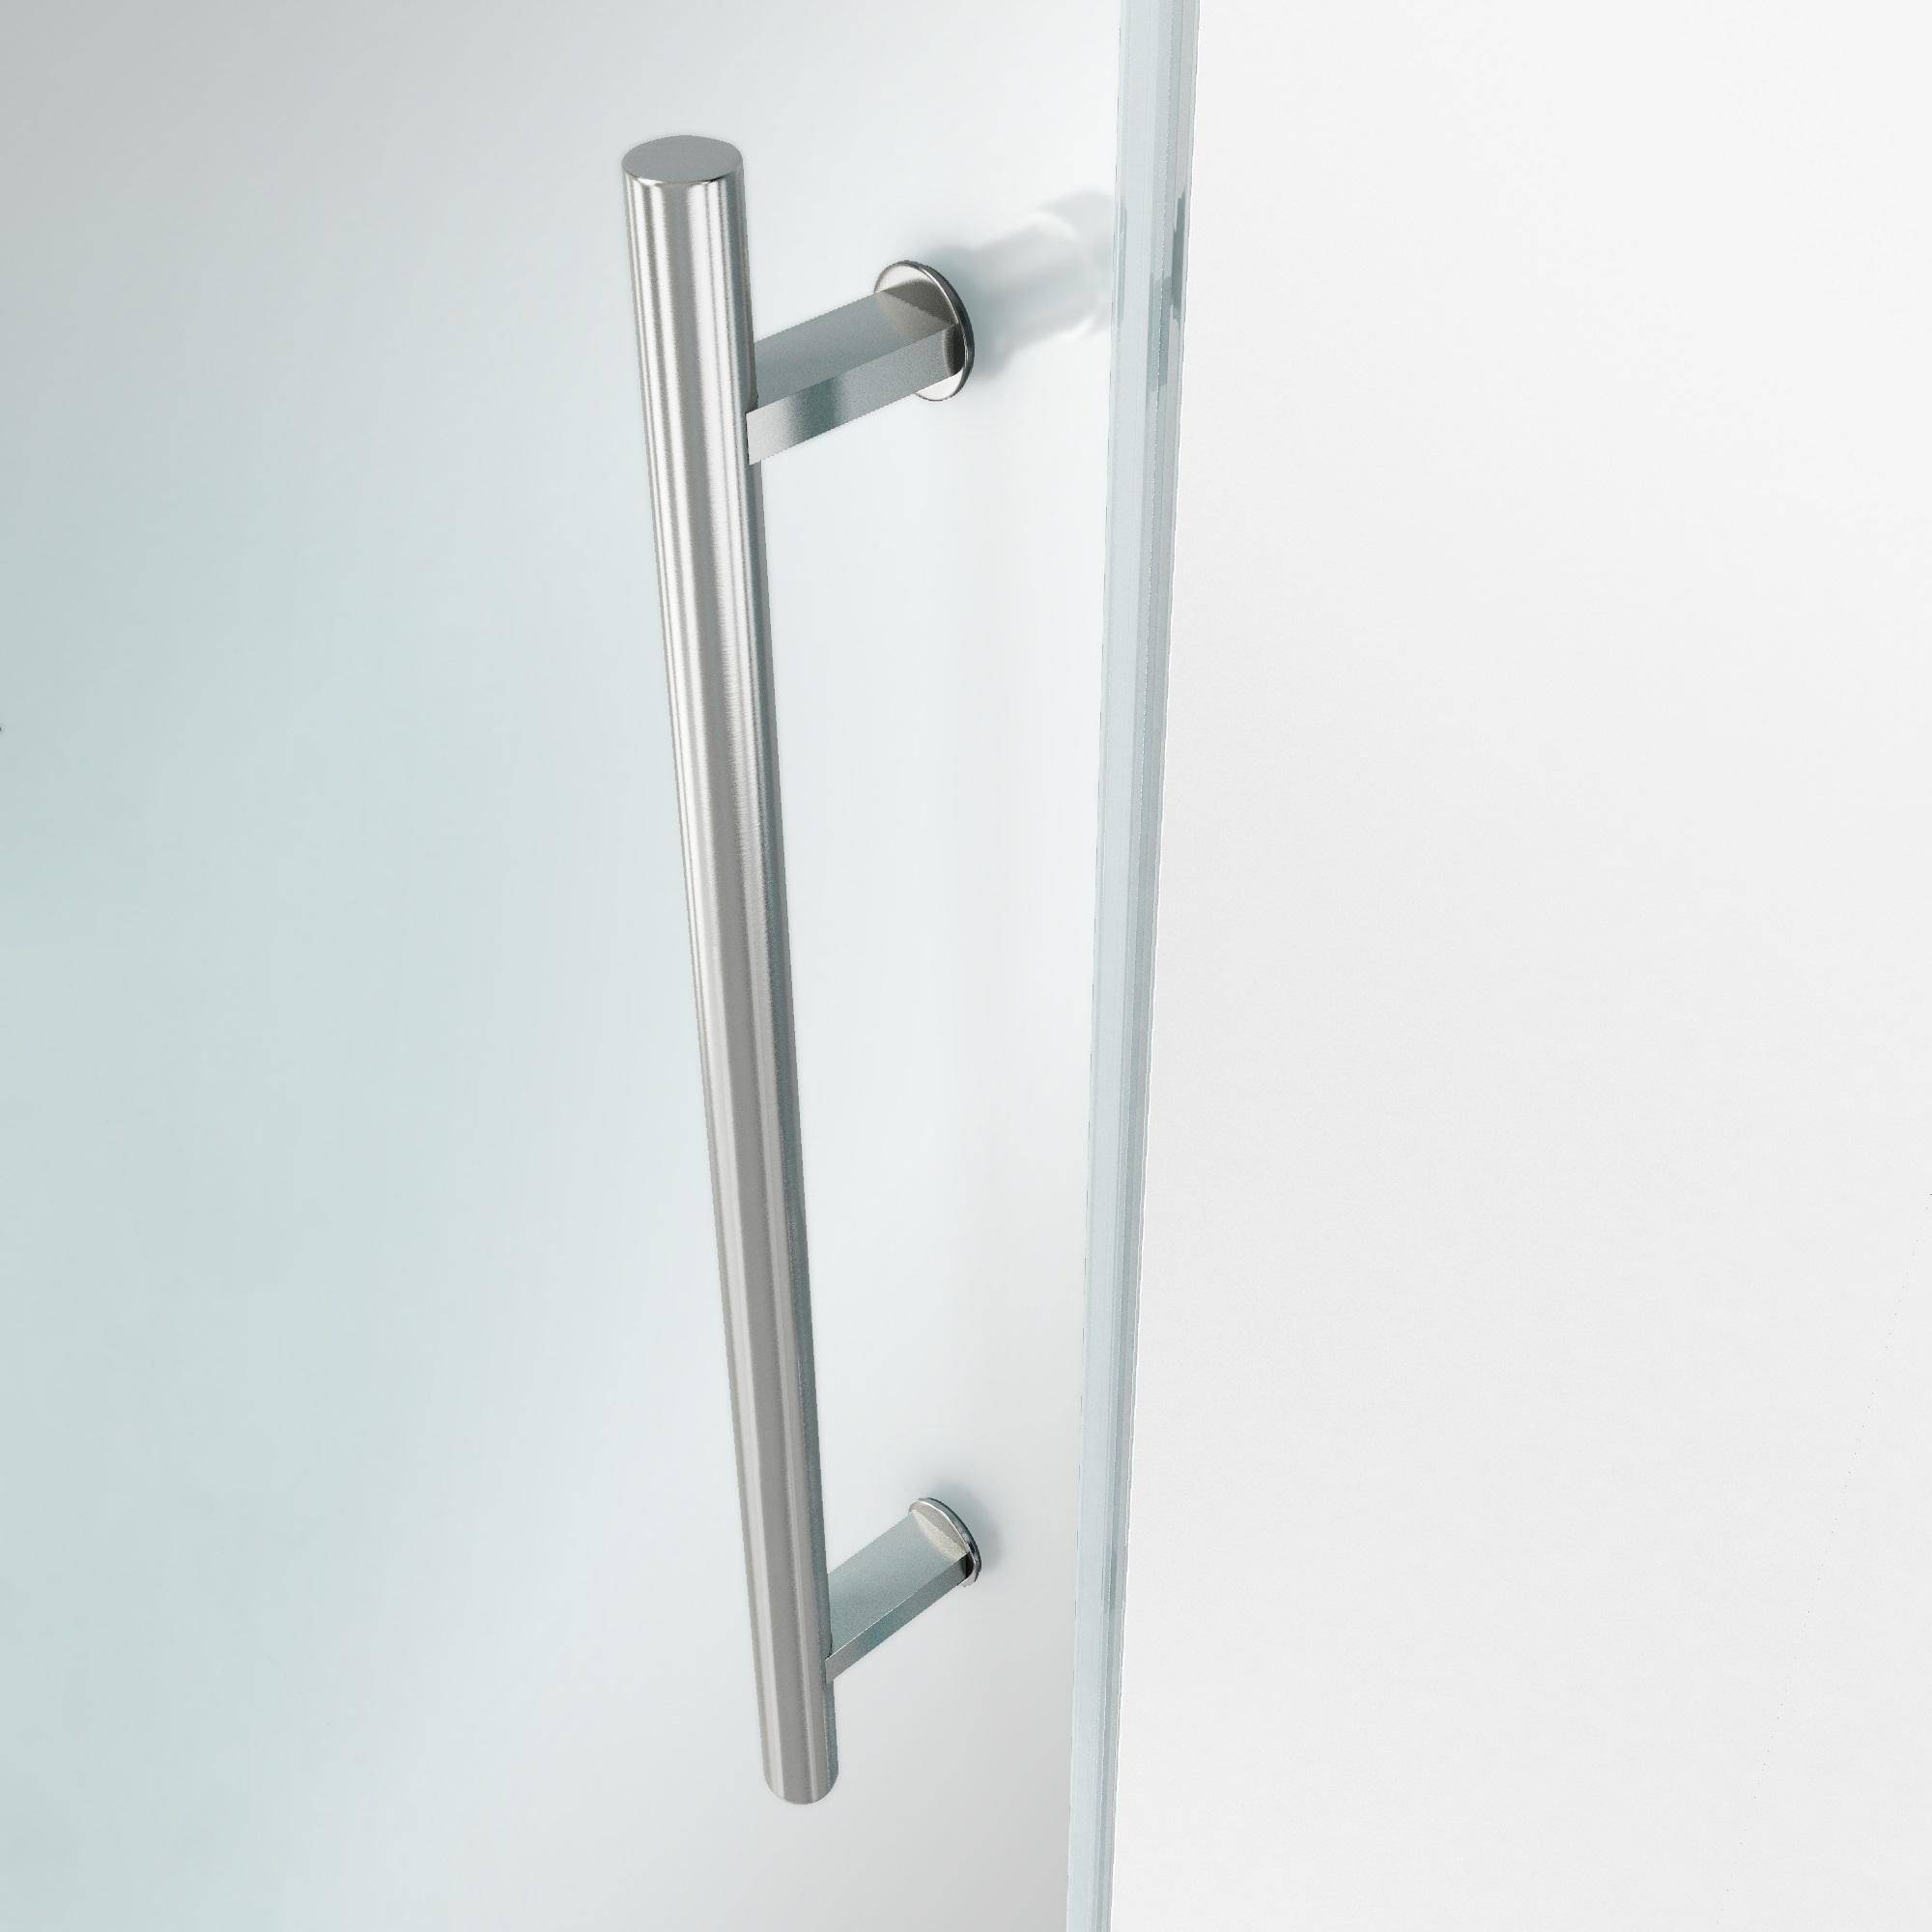 Temped Glass Details on the VIGO Elan Framless Glass Sliding Shower Door